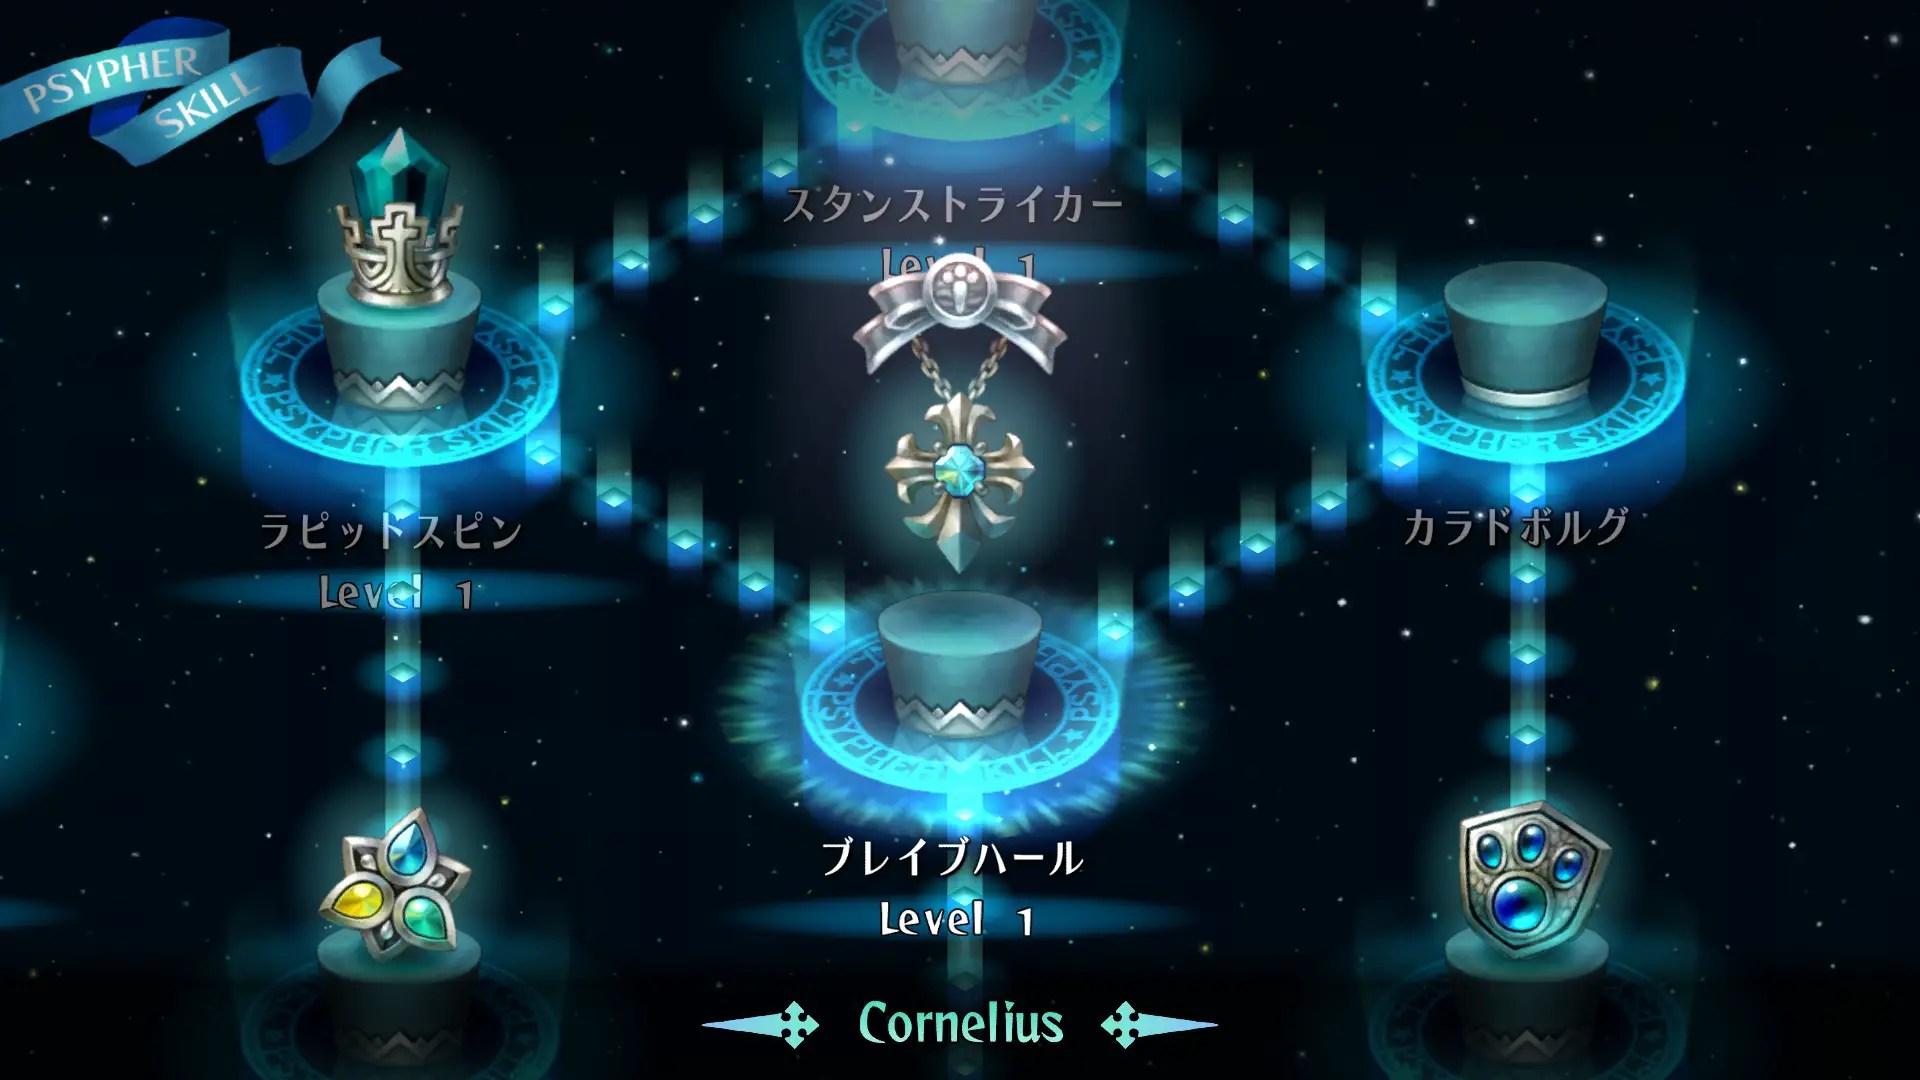 Odin Sphere Leifthrasir Receives A Ton Of New Screenshots